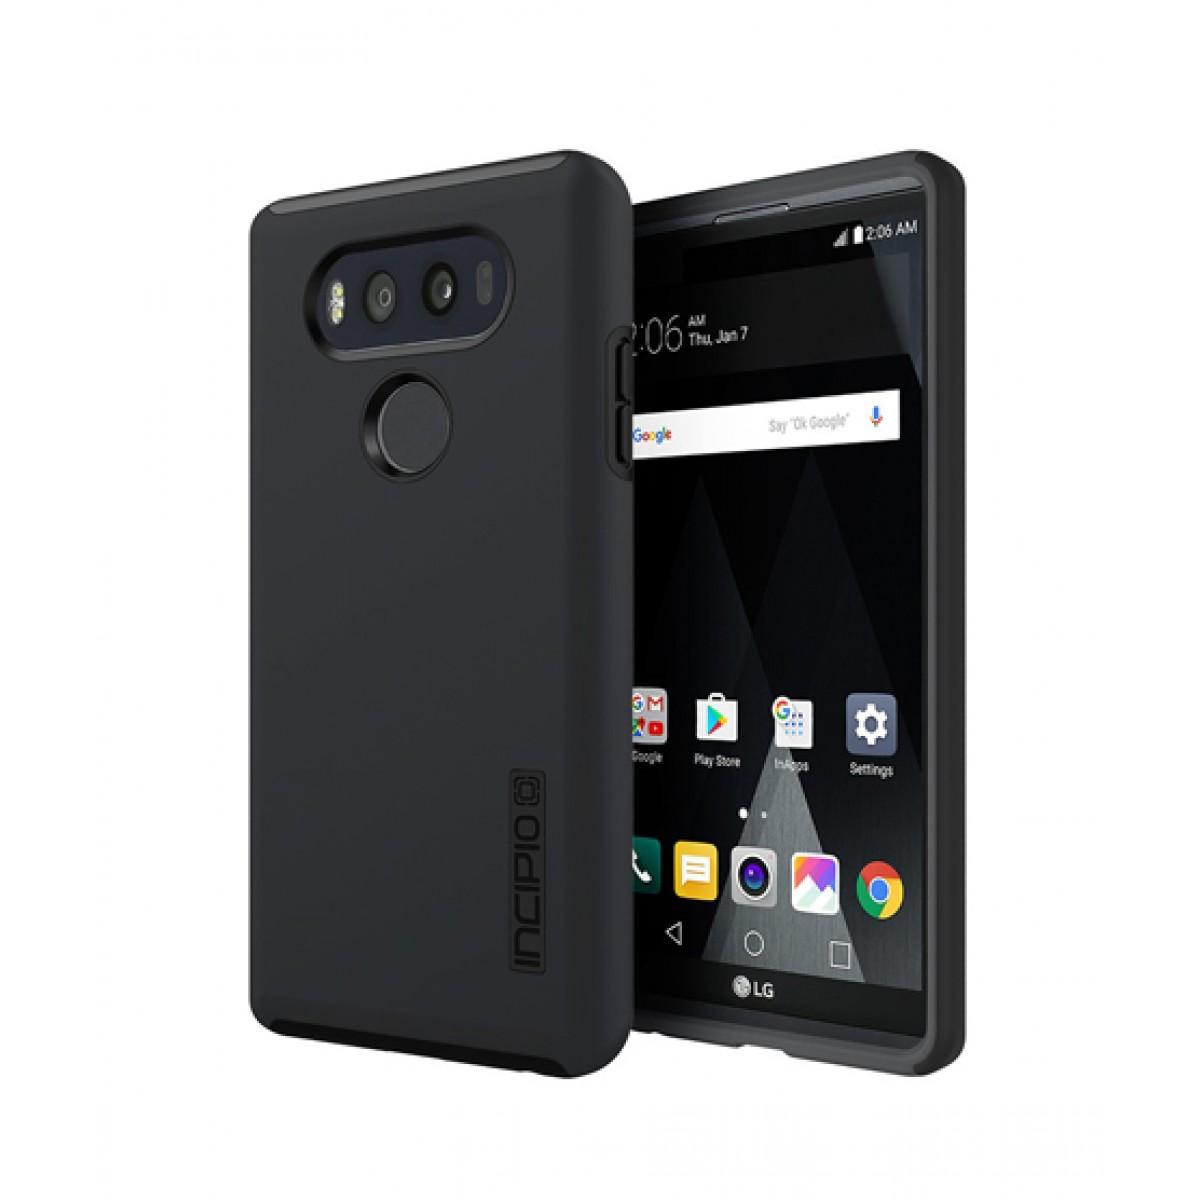 brand new 1bc27 a14d5 Incipio DualPro Black/Black Hard Shell Case For LG V20